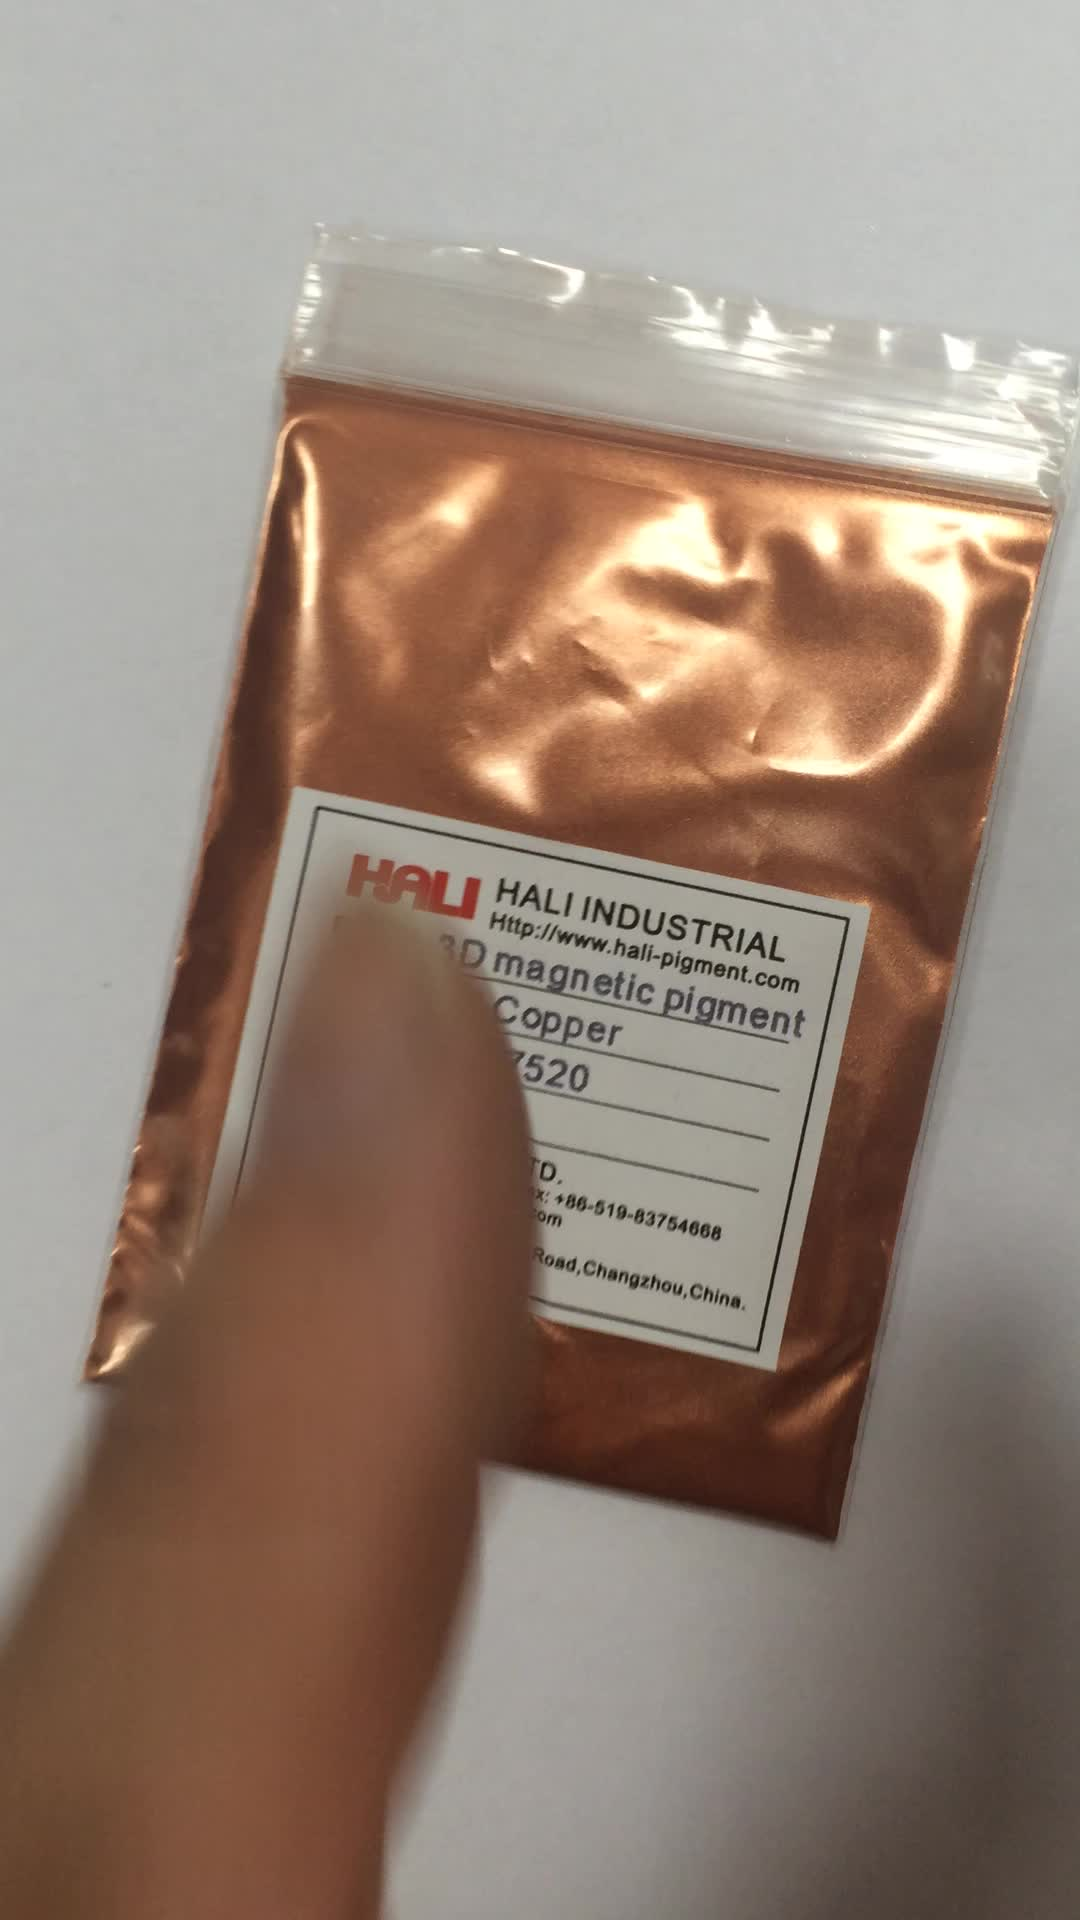 3D magnetic pigment,three-dimensional powder,item:HL3D7520,color:red copper